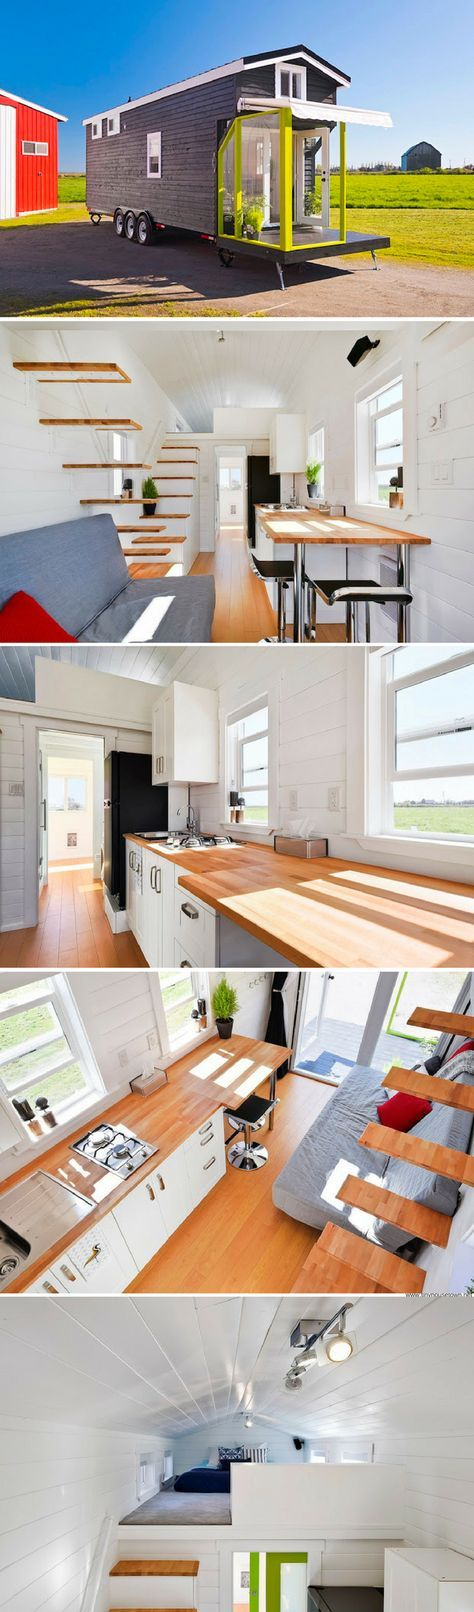 A custom home from the Mint Tiny House Company